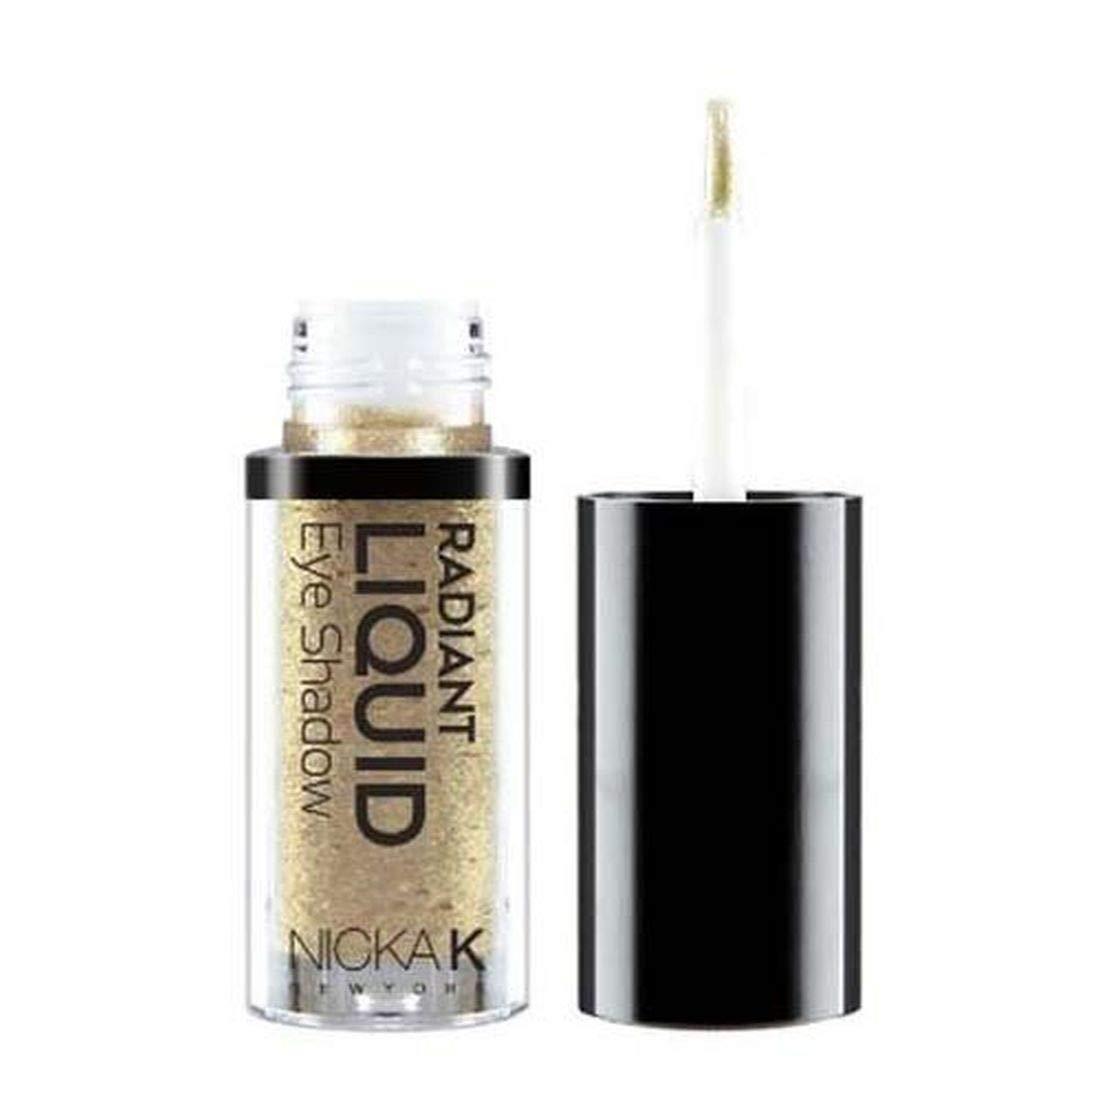 Nicka K Radiant Liquid Shadow, Ochroid Titan, 5g